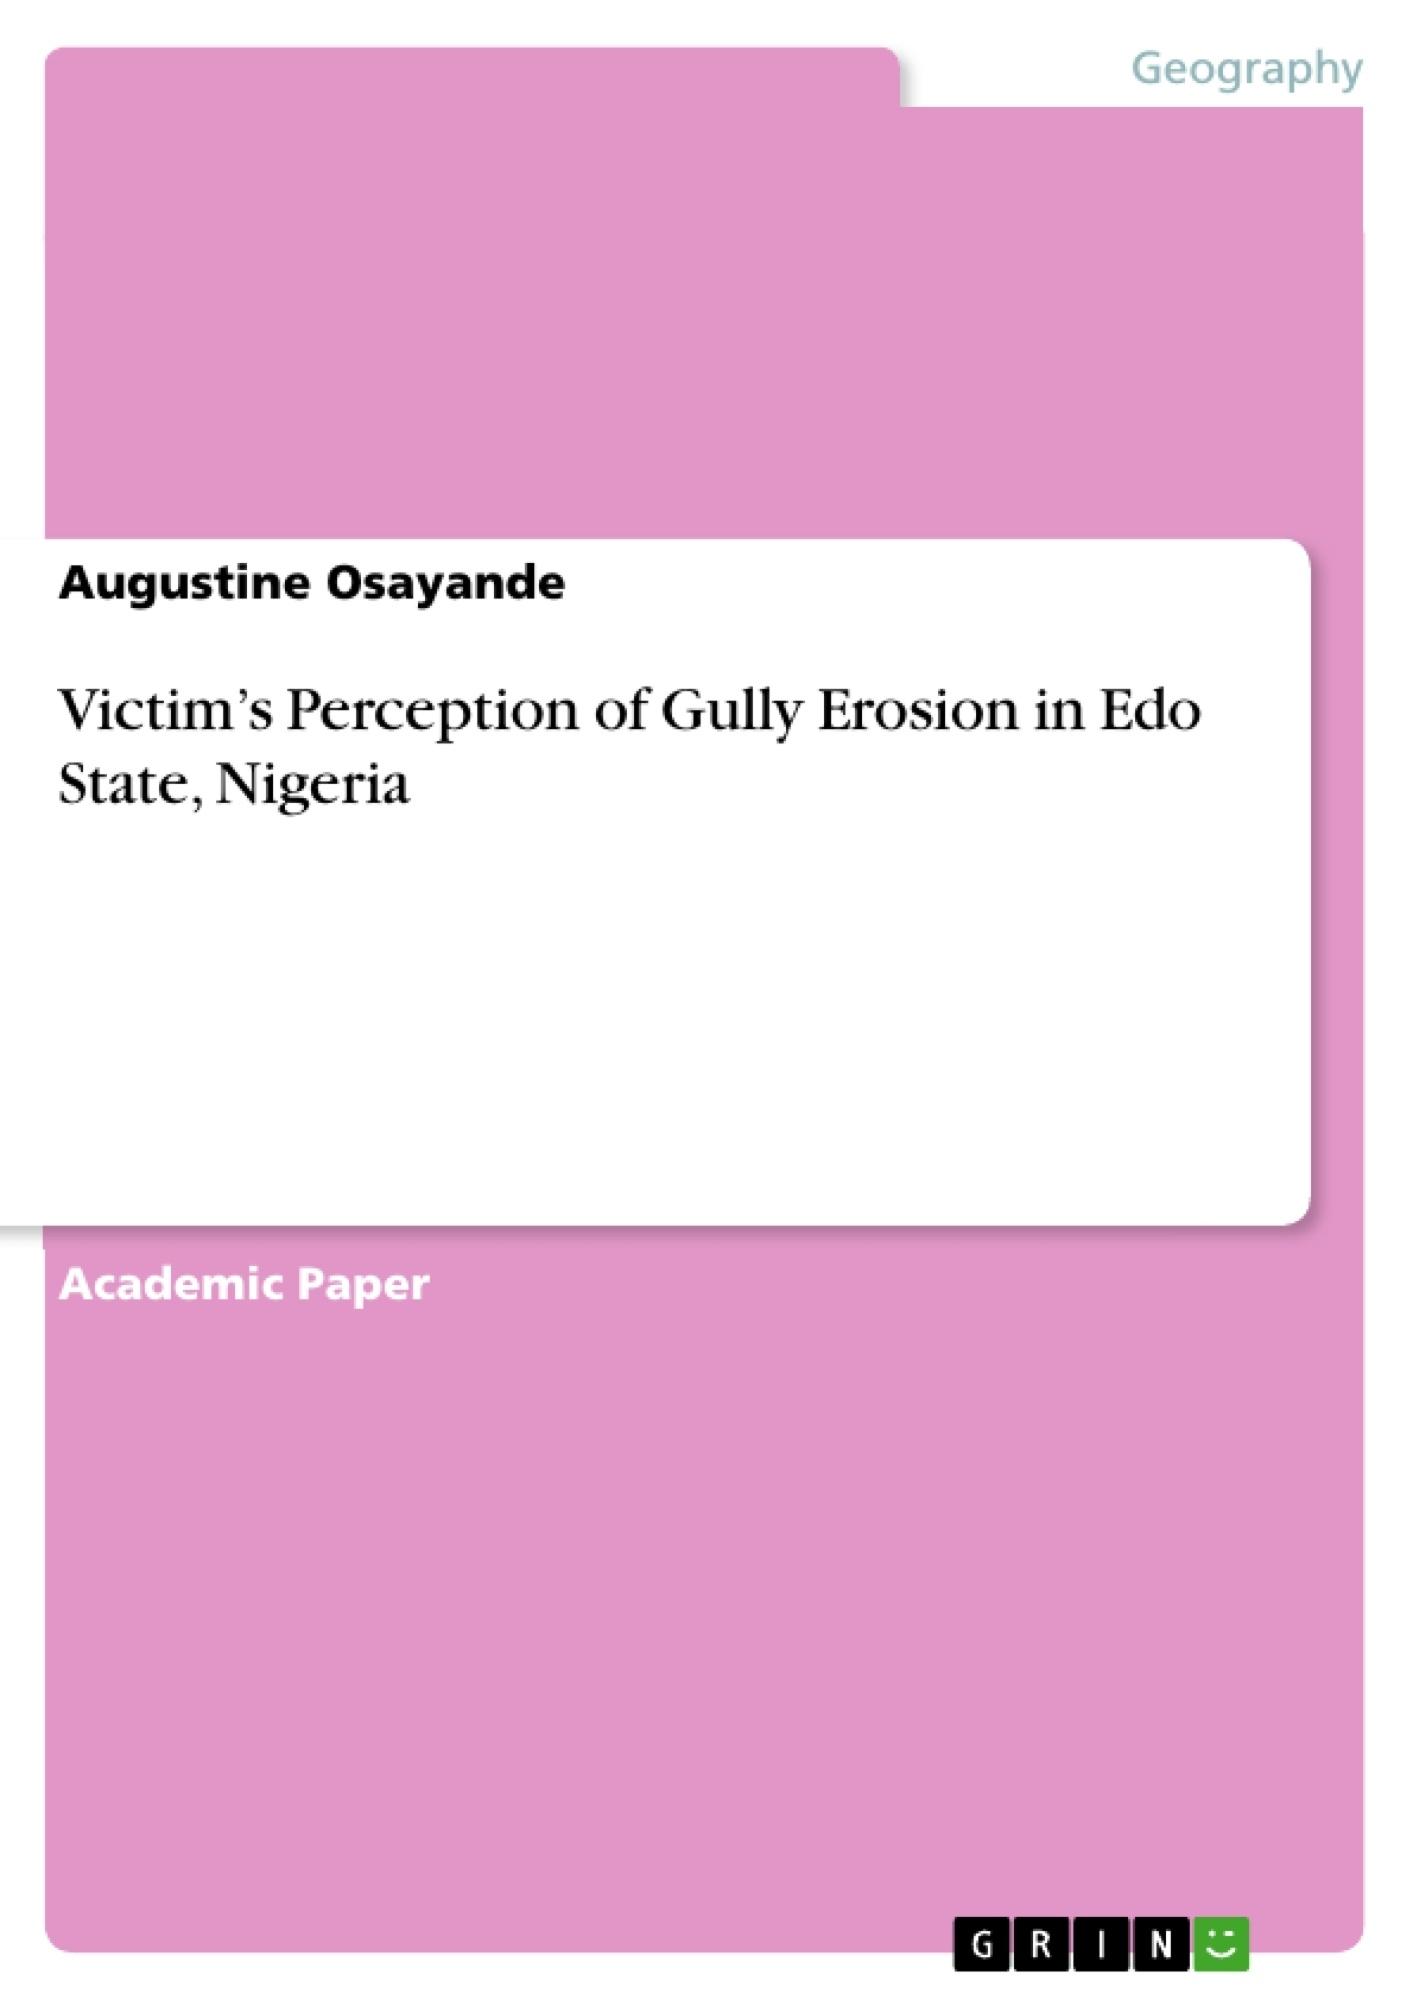 Title: Victim's Perception of Gully Erosion in Edo State, Nigeria